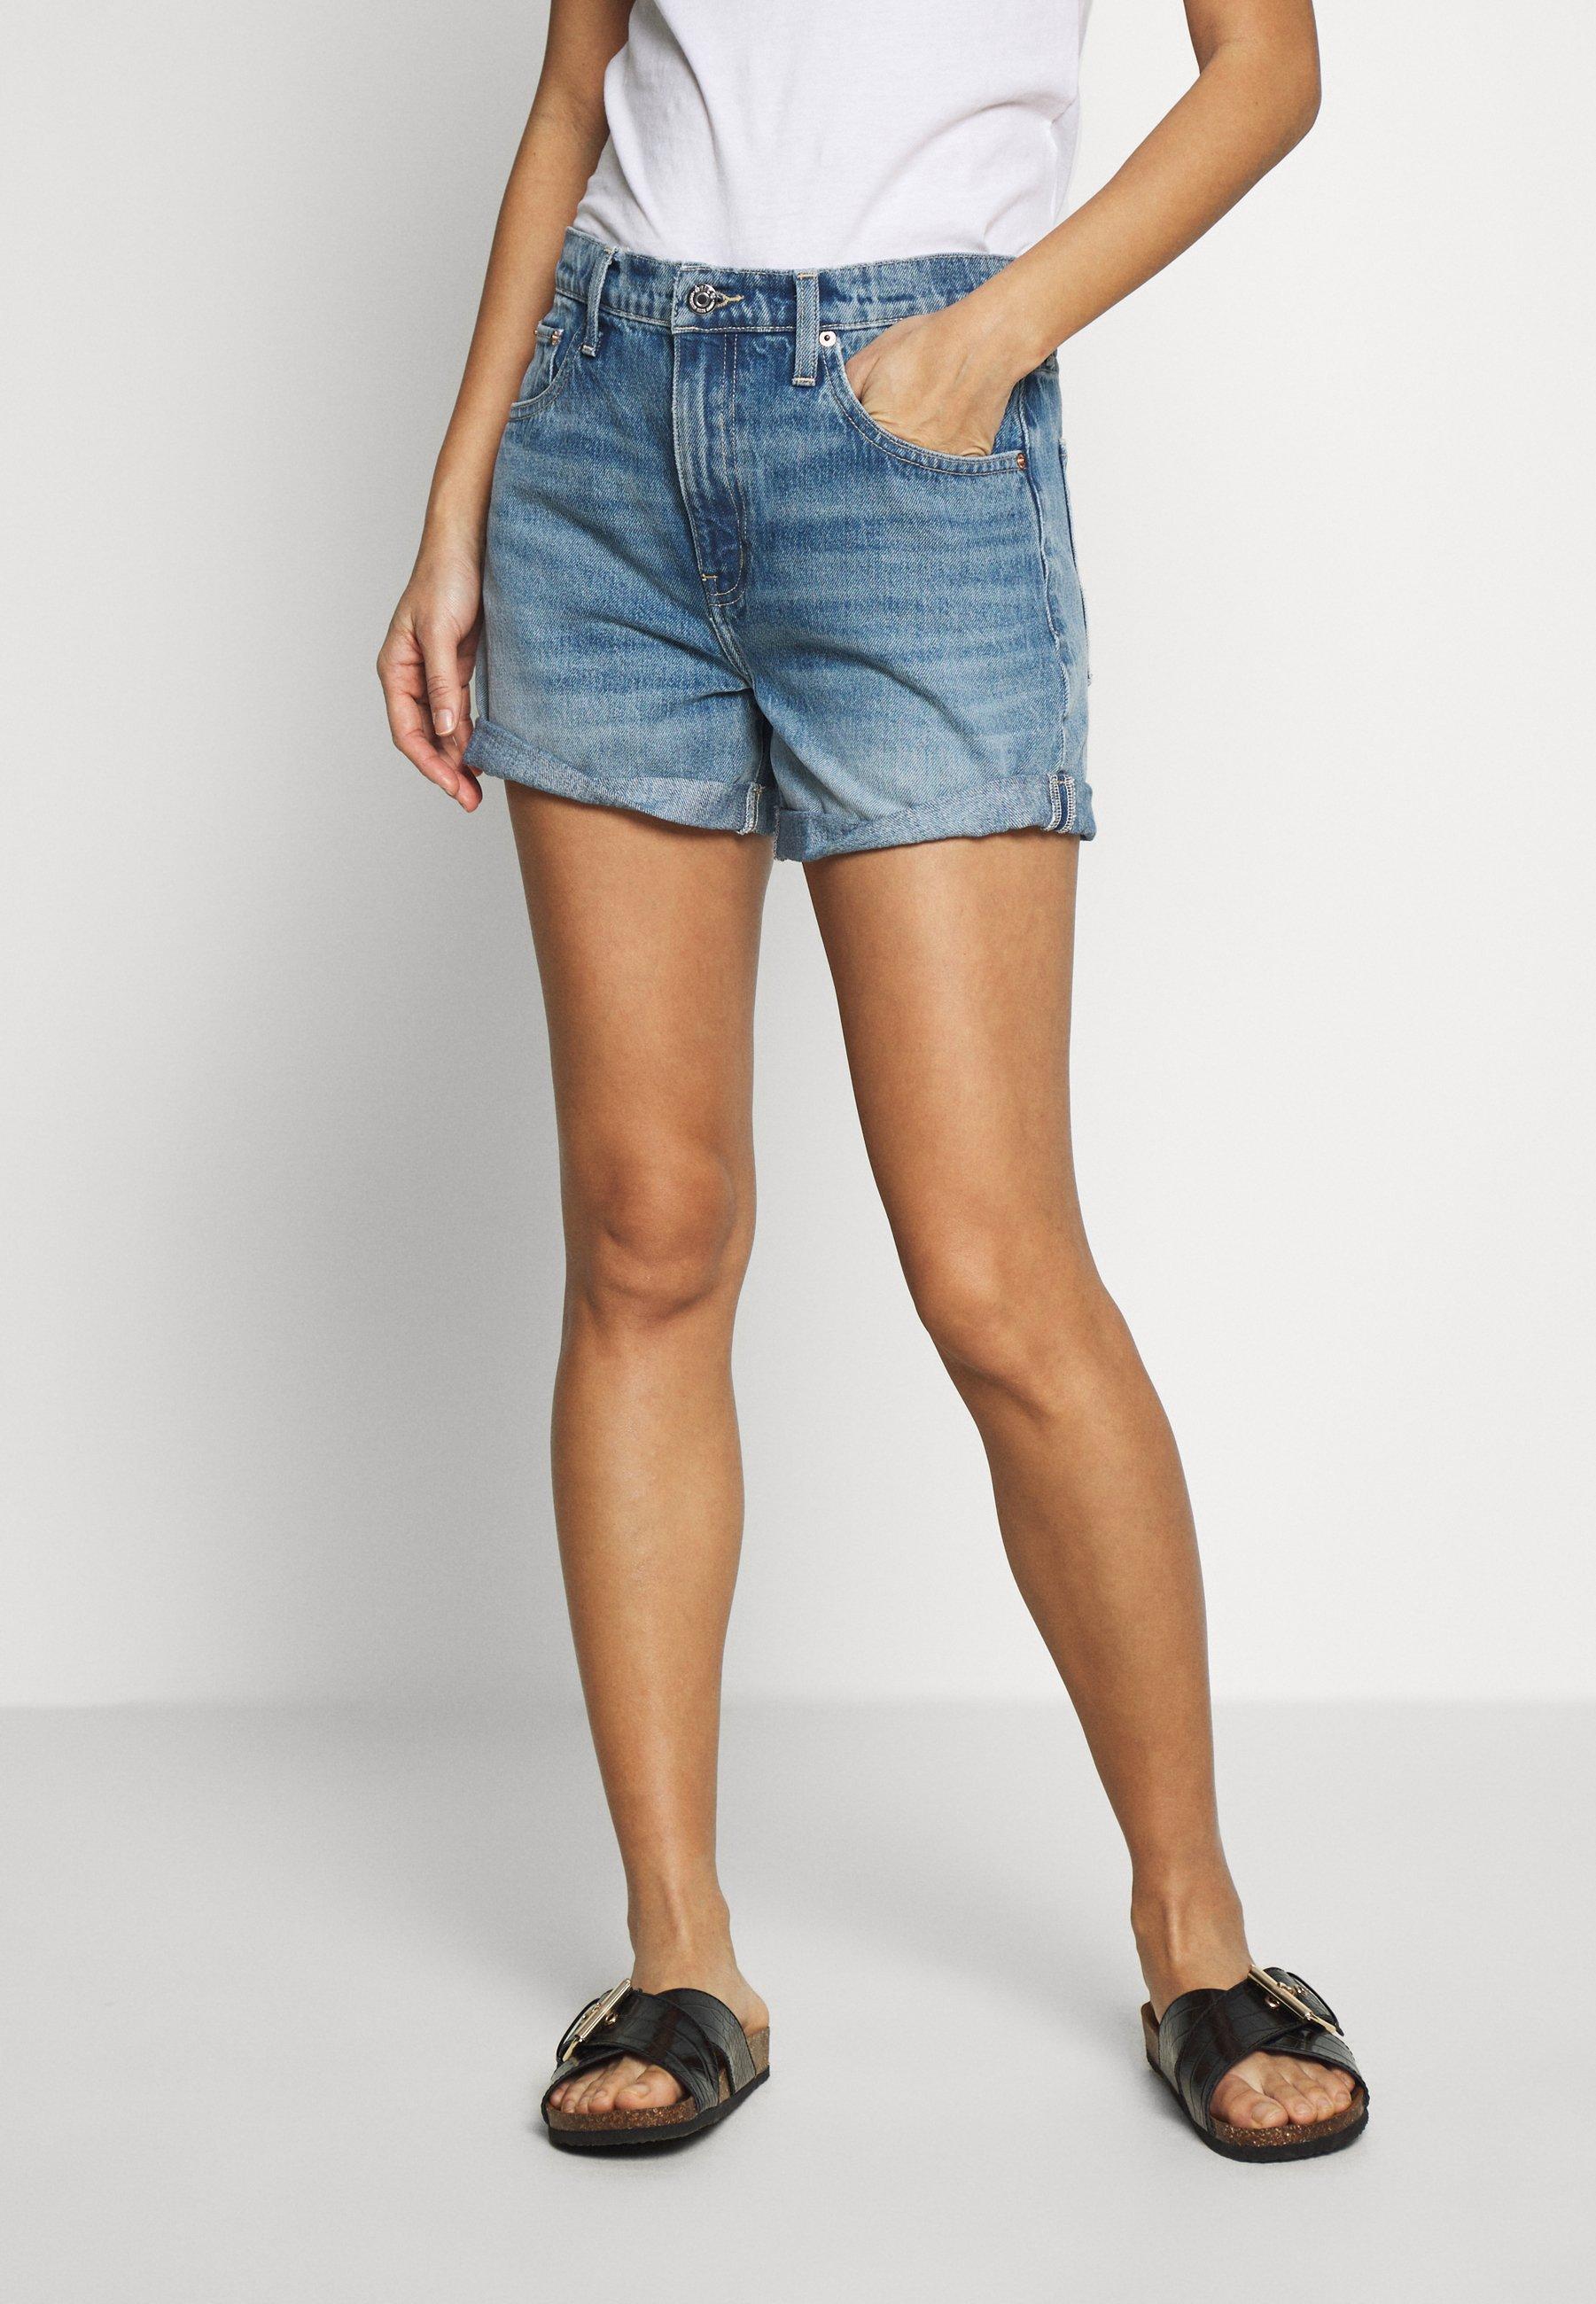 Limit Discount Women's Clothing Ética SKYLAR TWIST Denim shorts blue denim F7Q8bh3ki